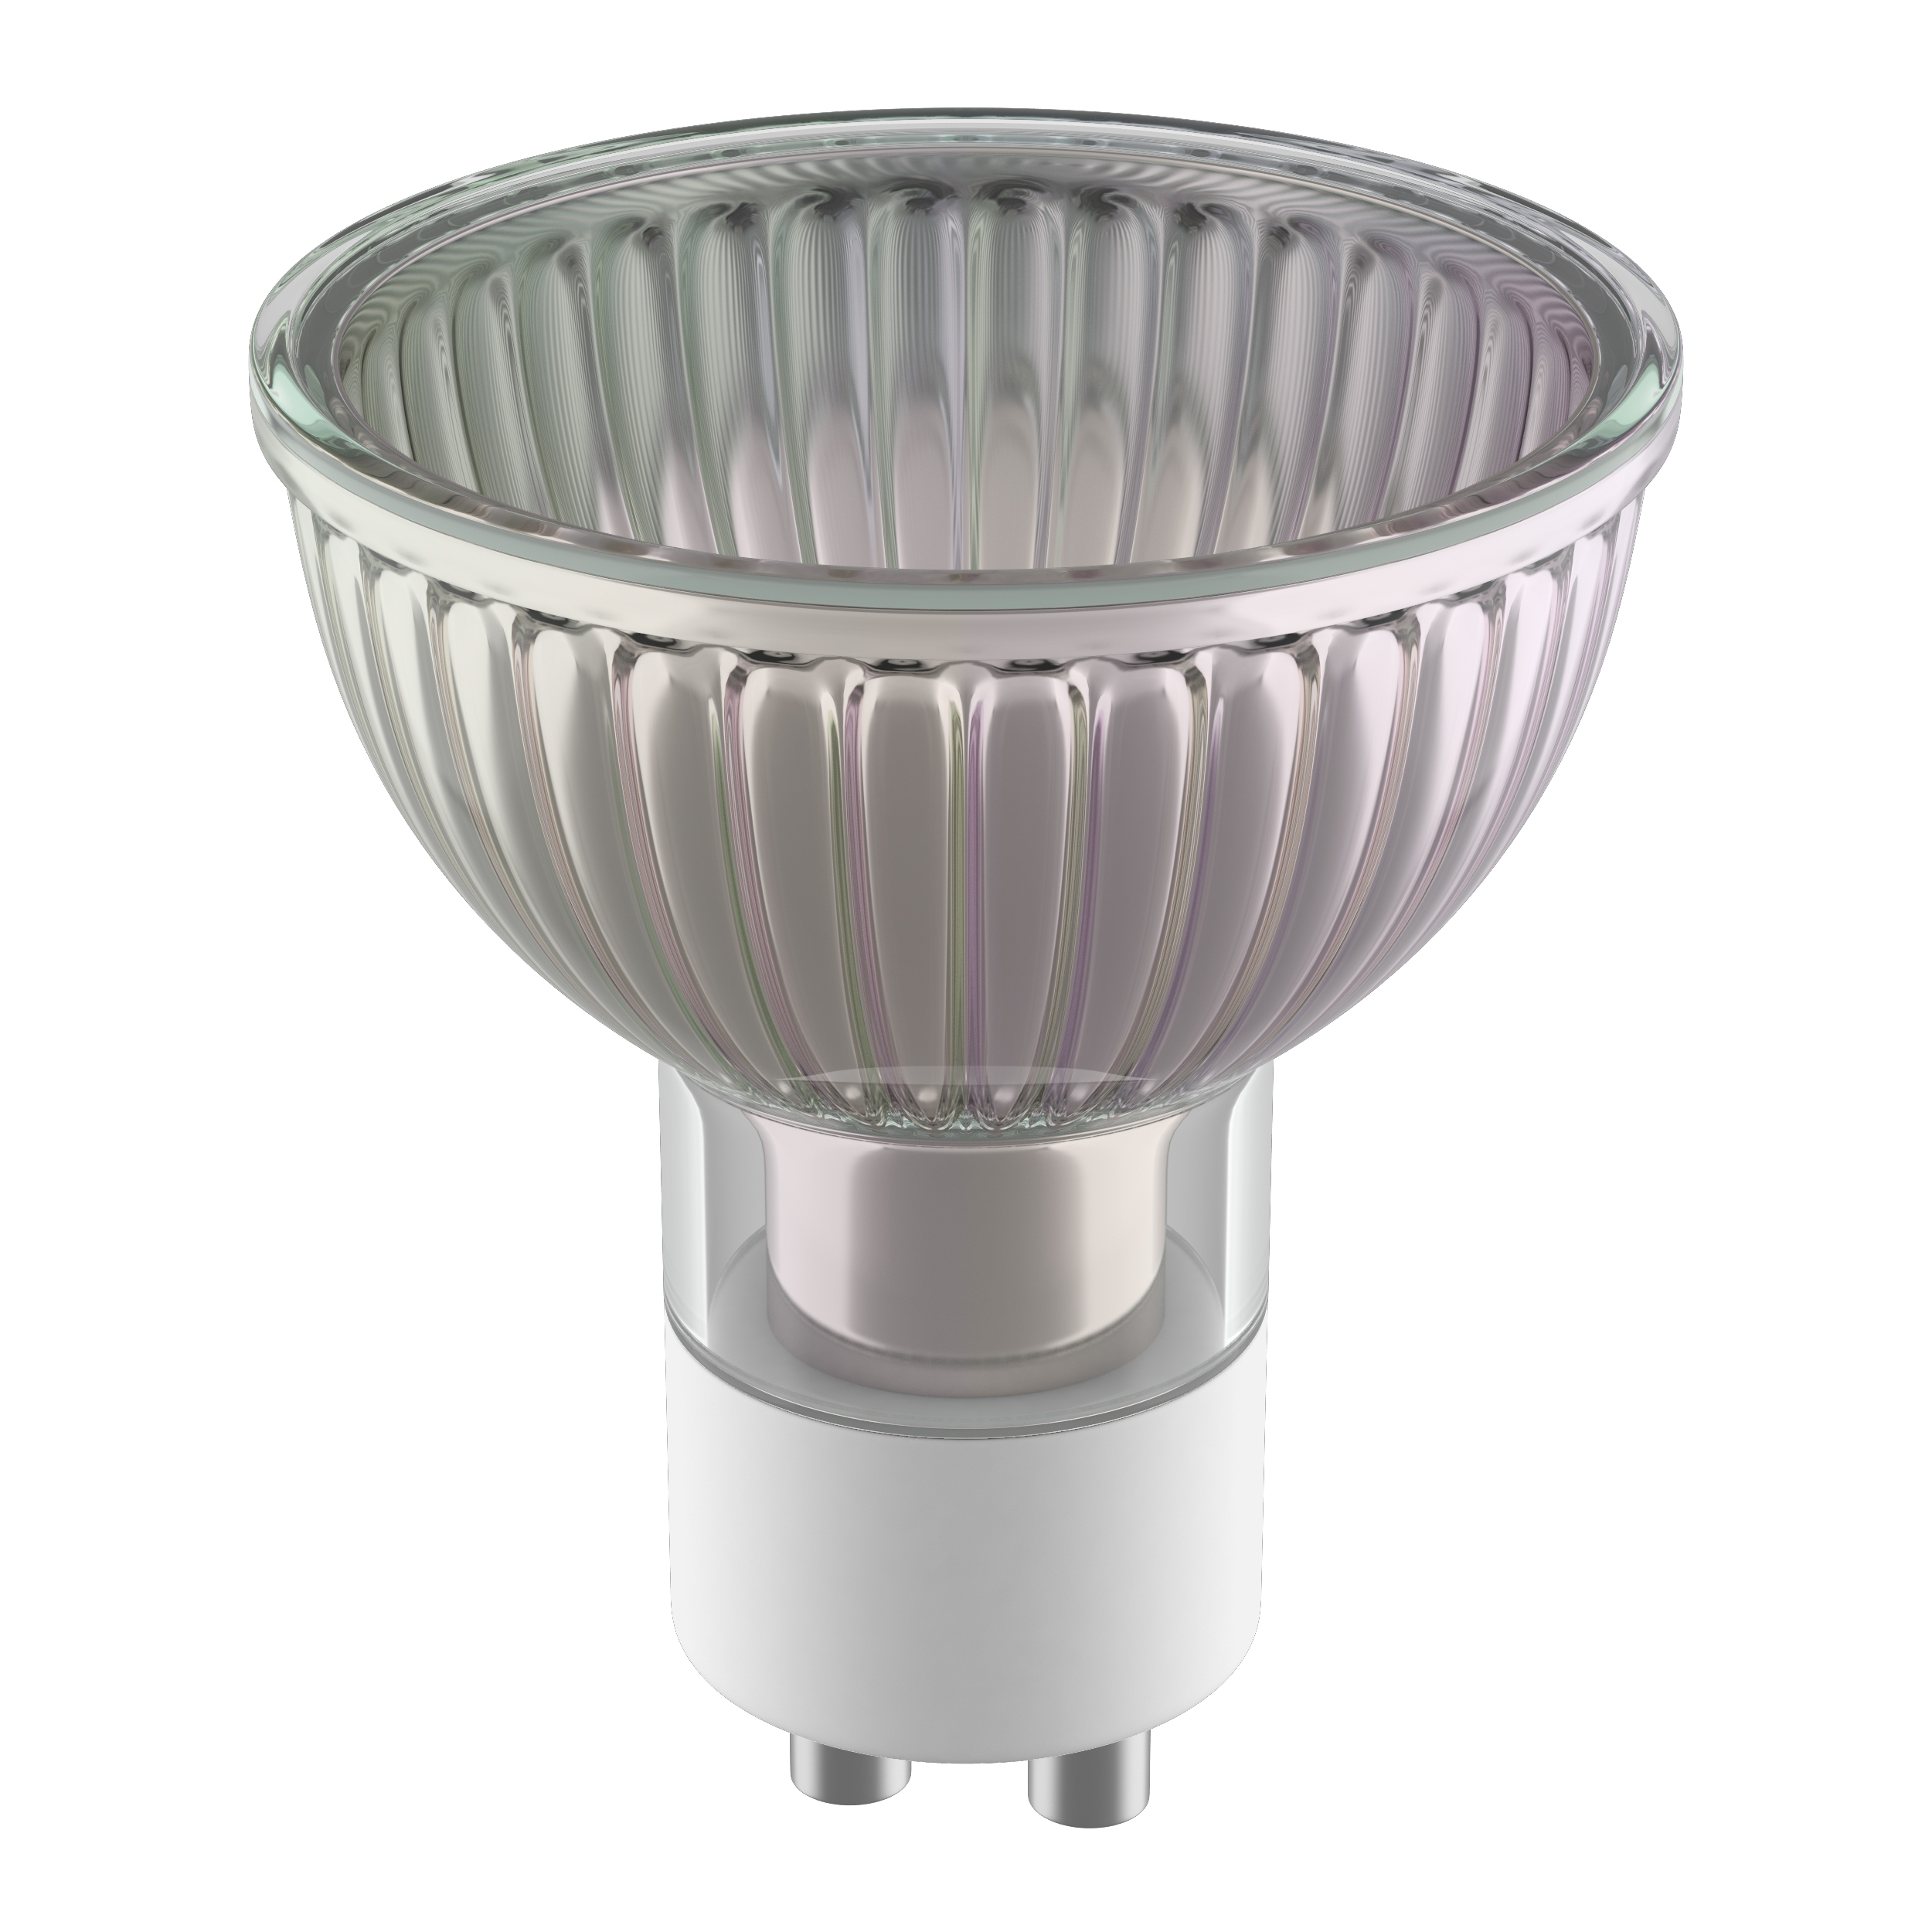 Галогенная лампа Lightstar HAL 922007 HP16 GU10 50W, 2800K (теплый) 220V, диммируемая, гарантия нет гарантии - фото 1